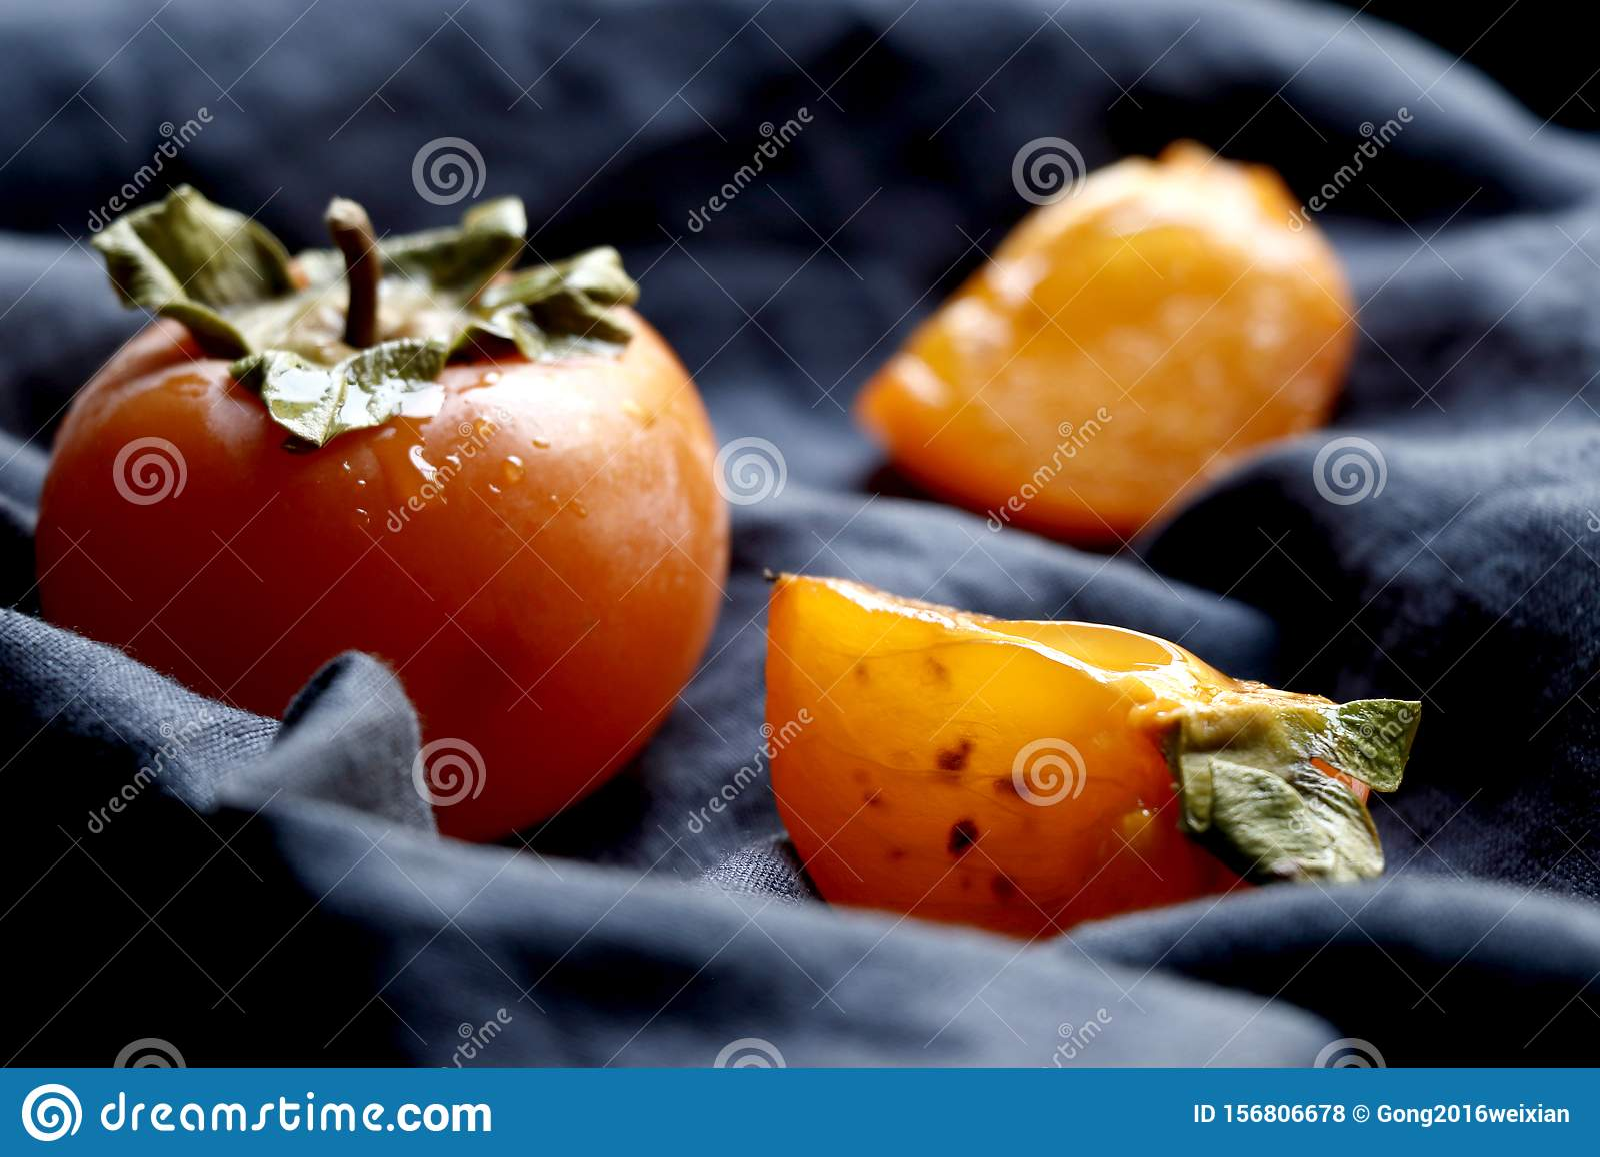 Slices of Orange red persimmon fruit.Fresh kaki on classical blue cloth.